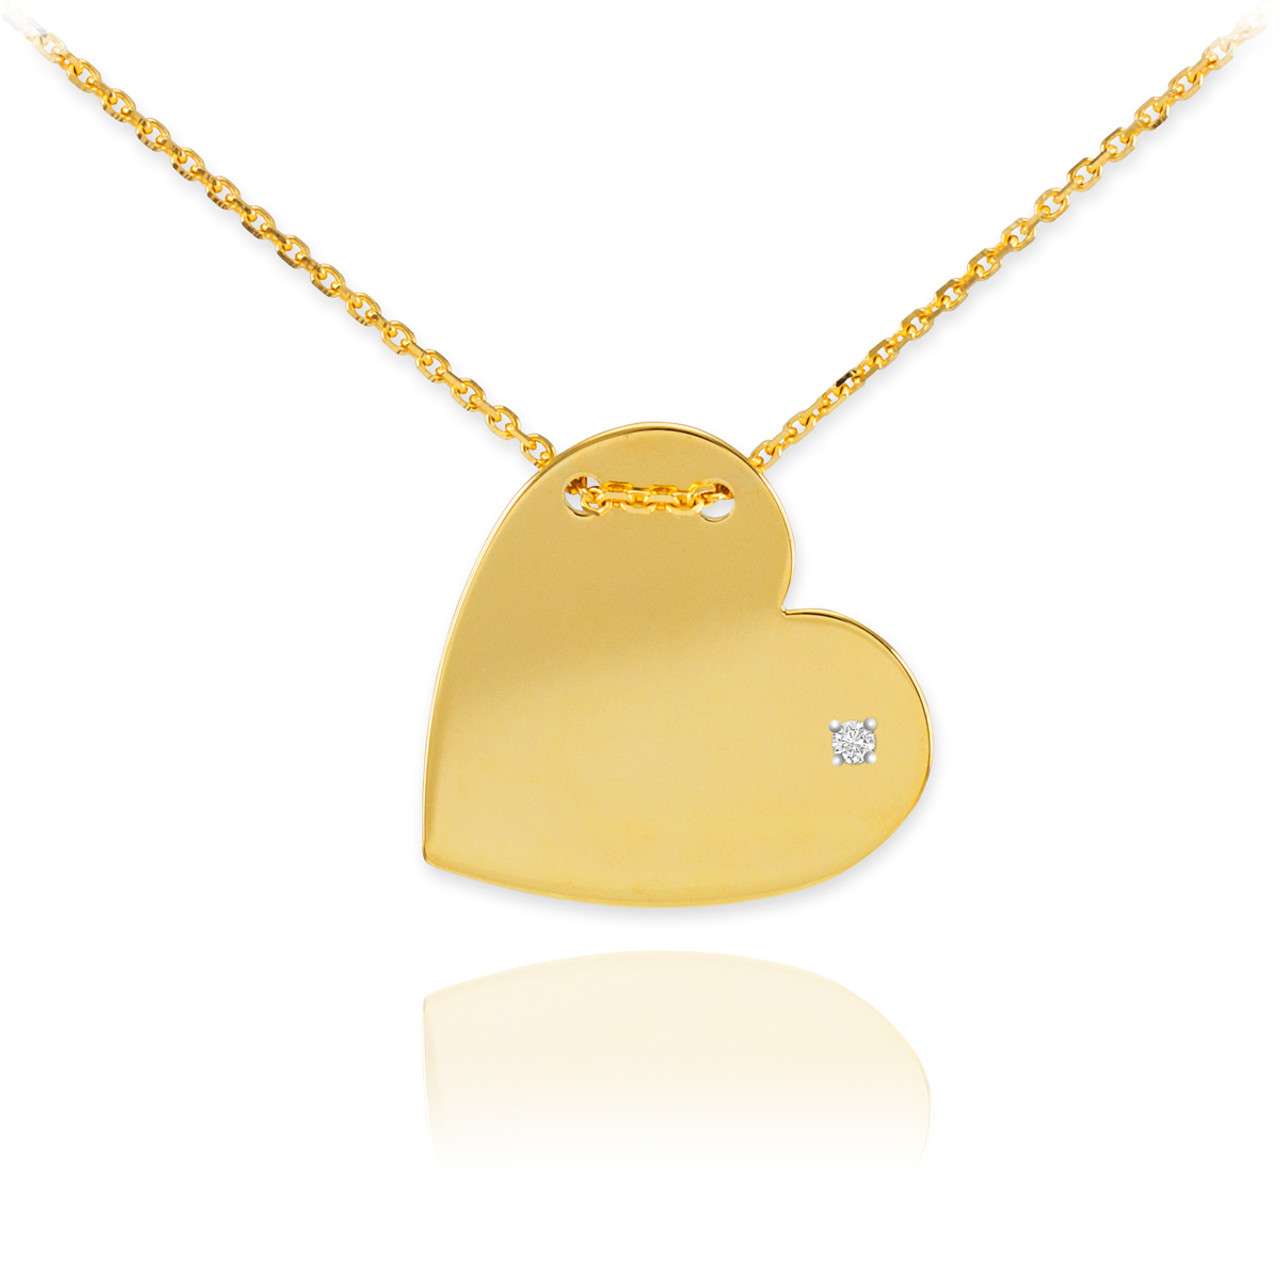 14k gold diamond engravable heart necklace engravable necklaces 14k gold diamond engravable heart necklace aloadofball Choice Image